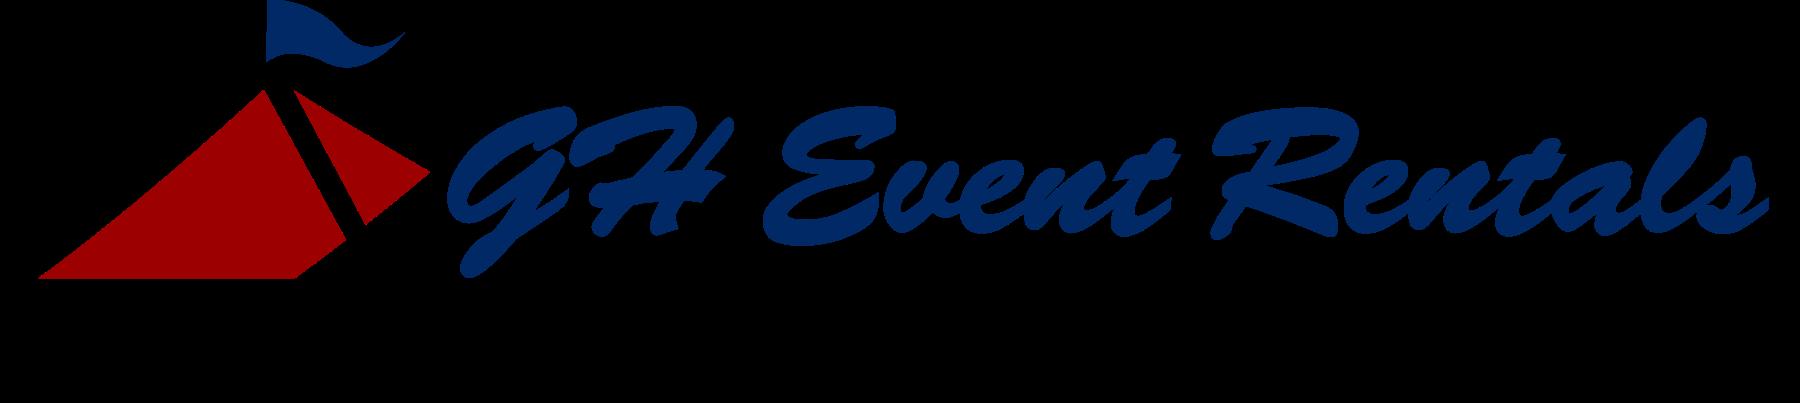 GH Event Rentals